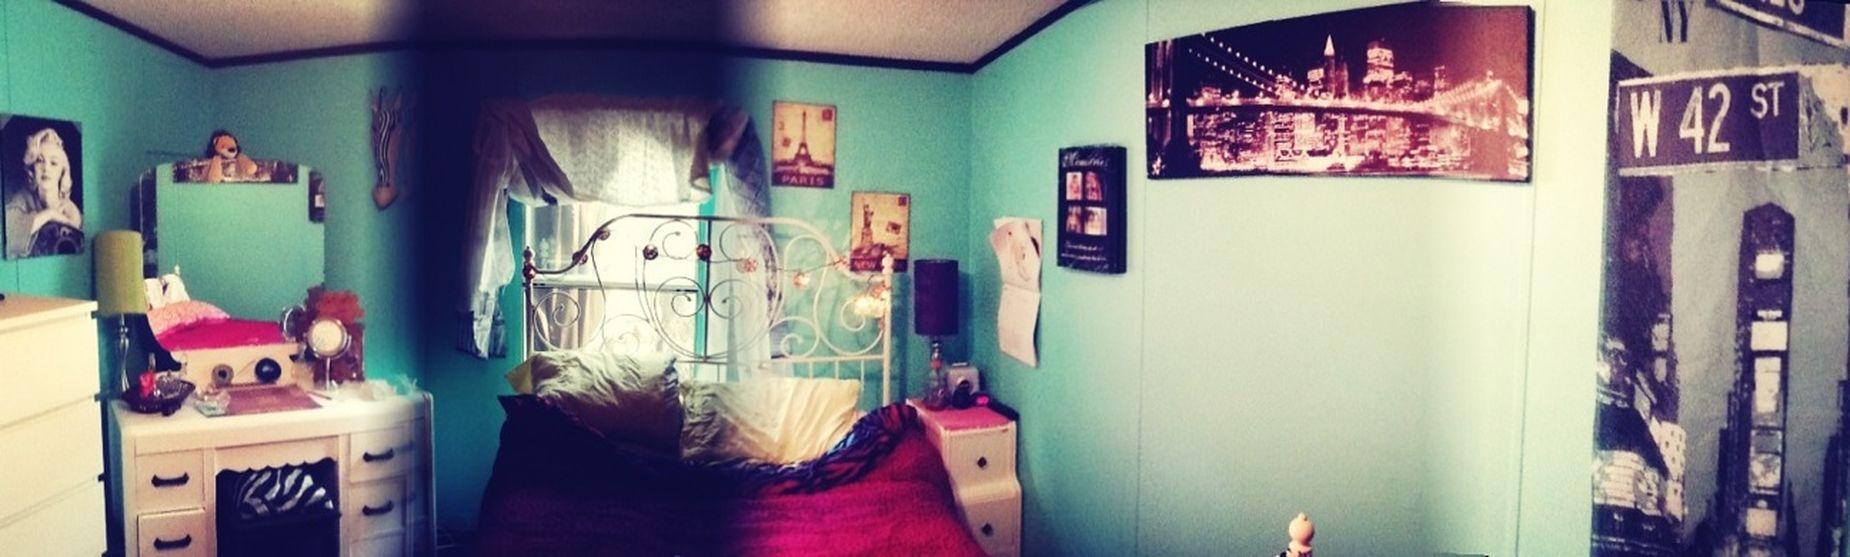 Creating My New Room